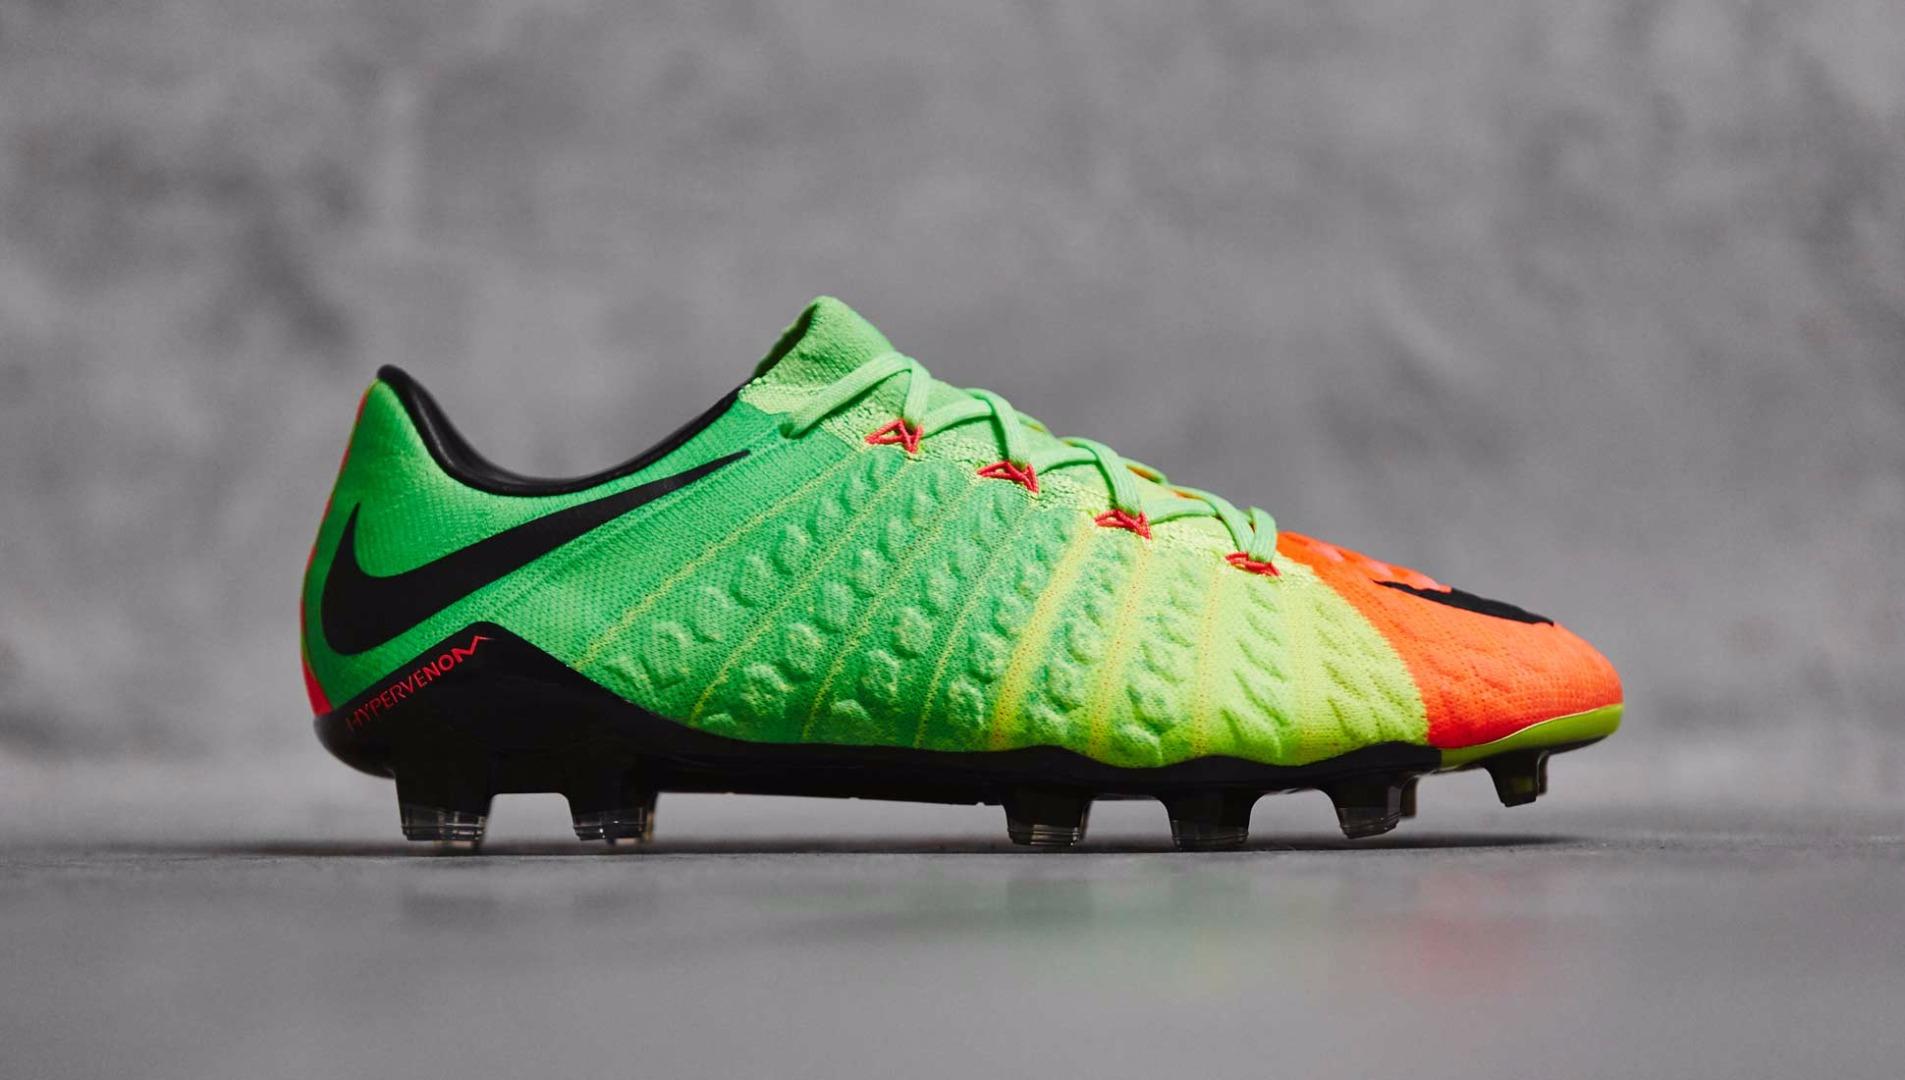 new style 70de6 dfe33 A Closer Look at the Nike Hypervenom Phantom 3 - SoccerBible